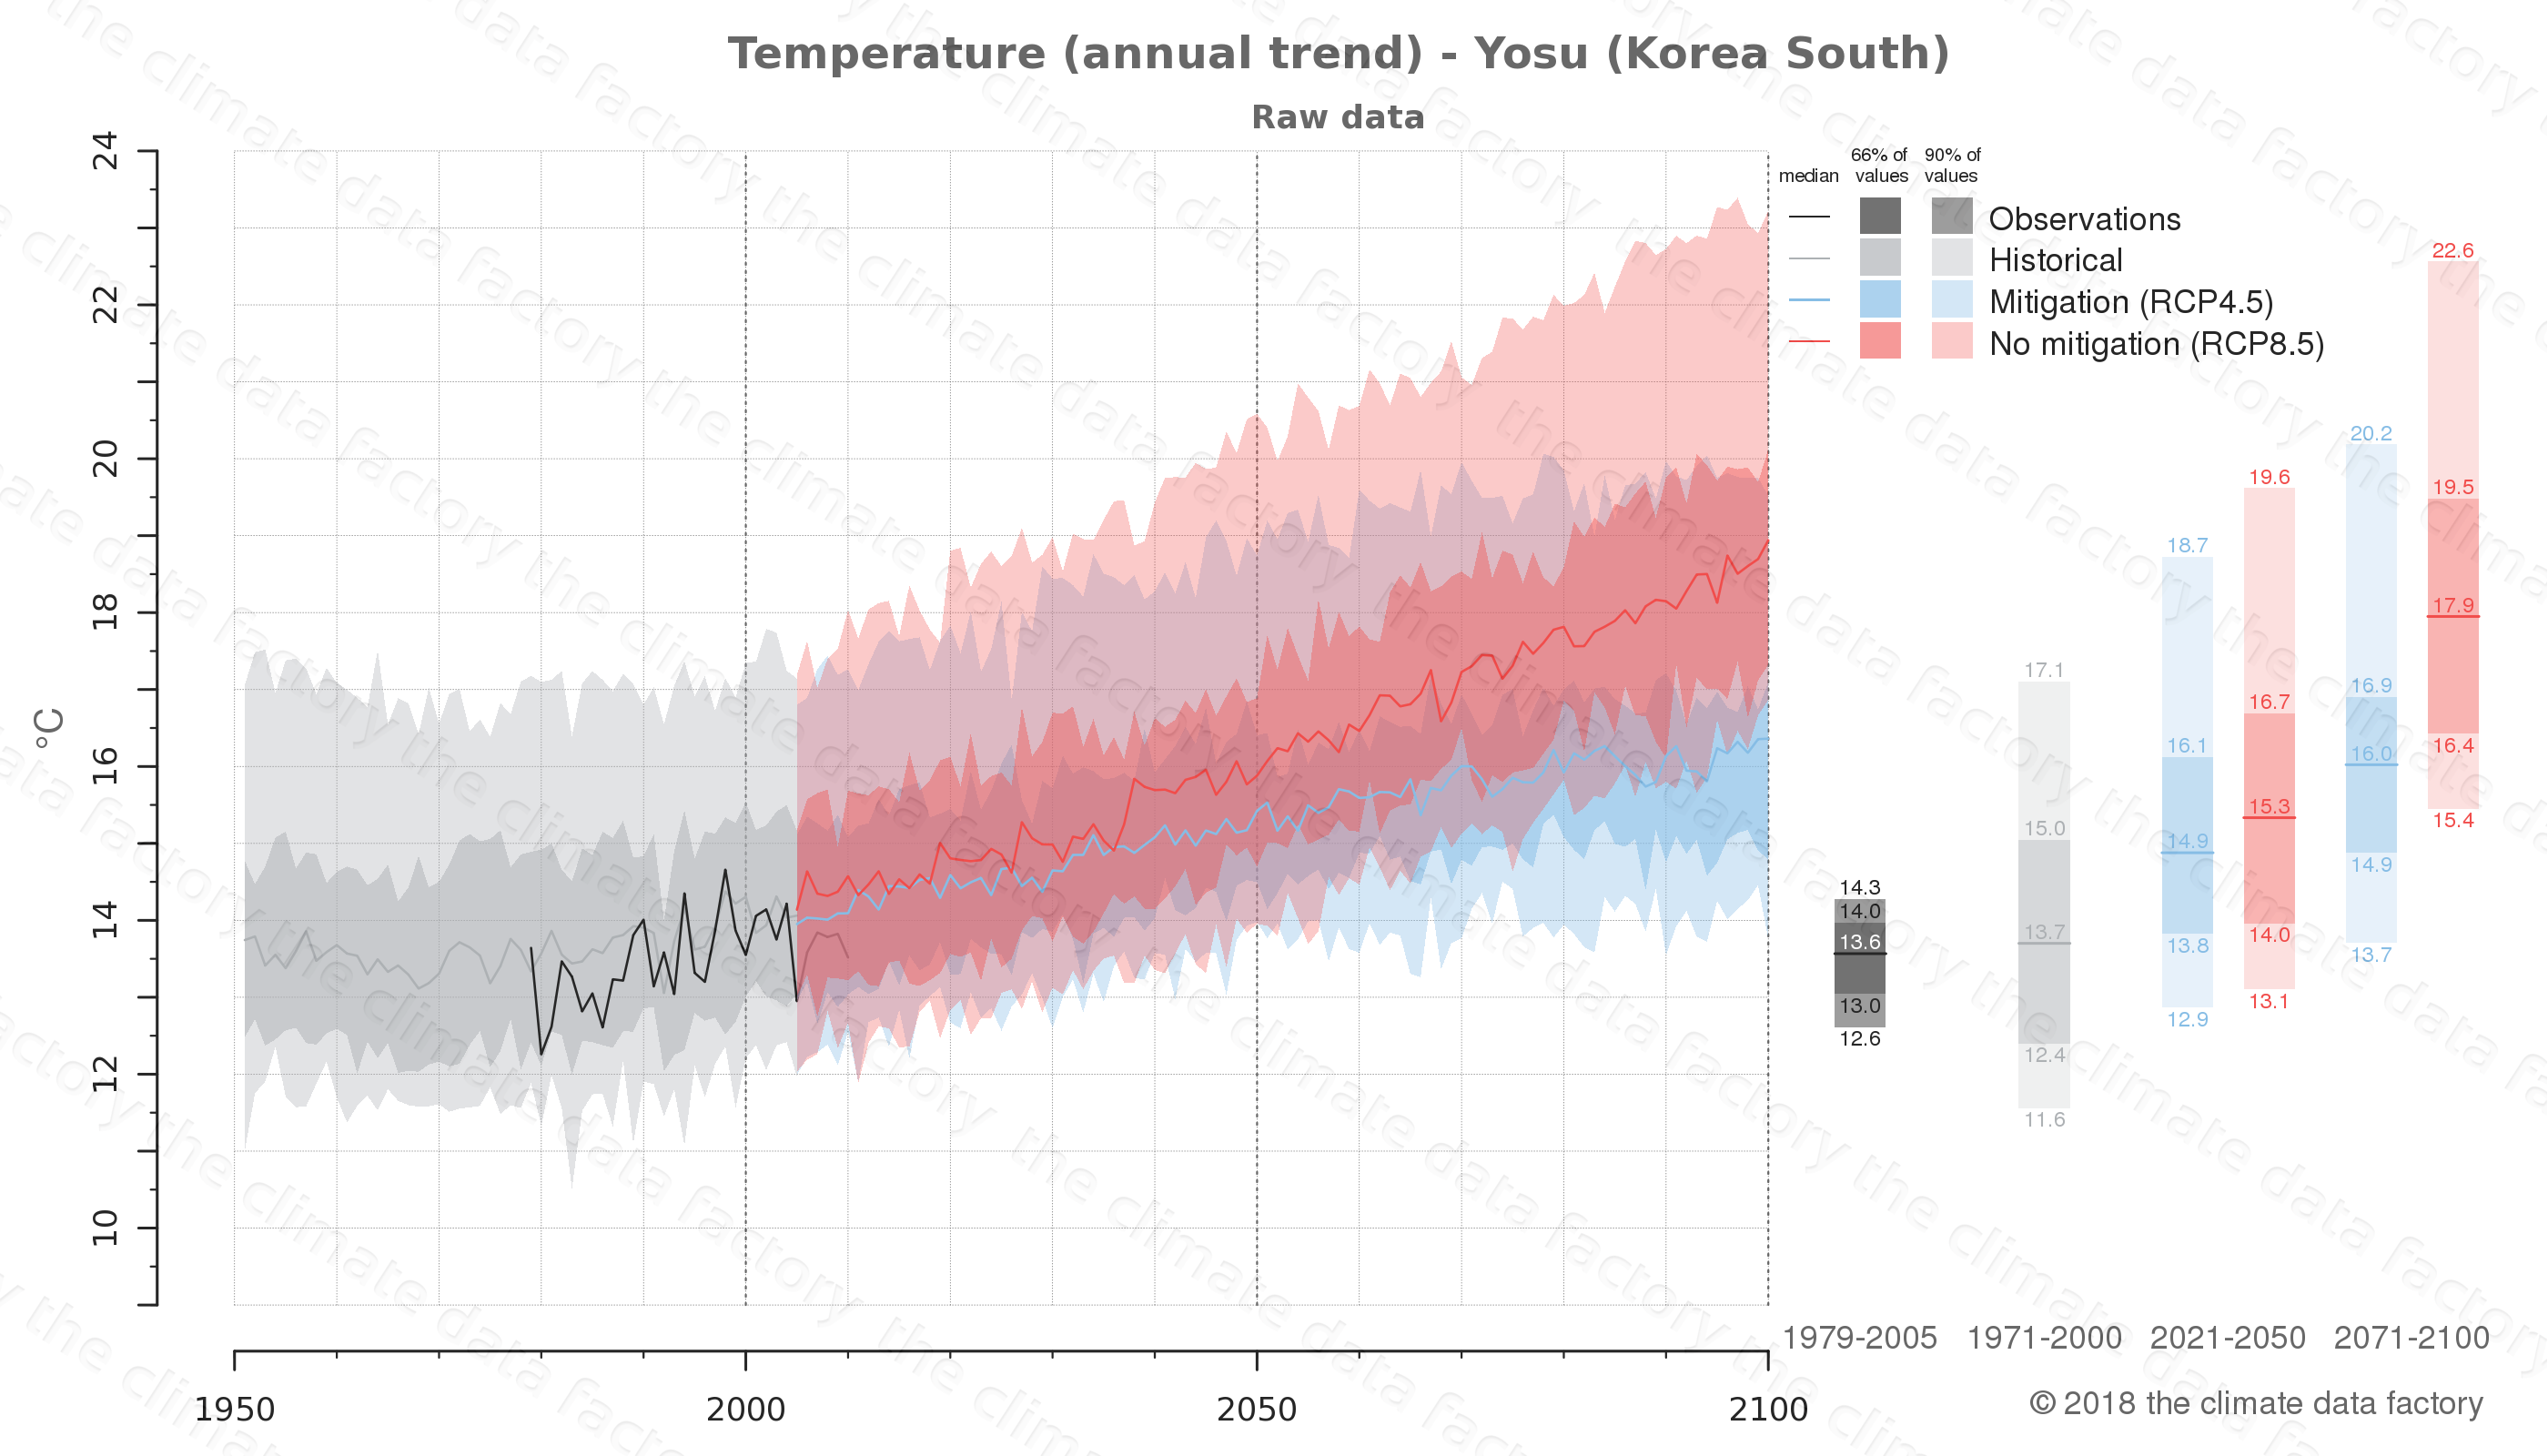 climate change data policy adaptation climate graph city data temperature yosu south korea